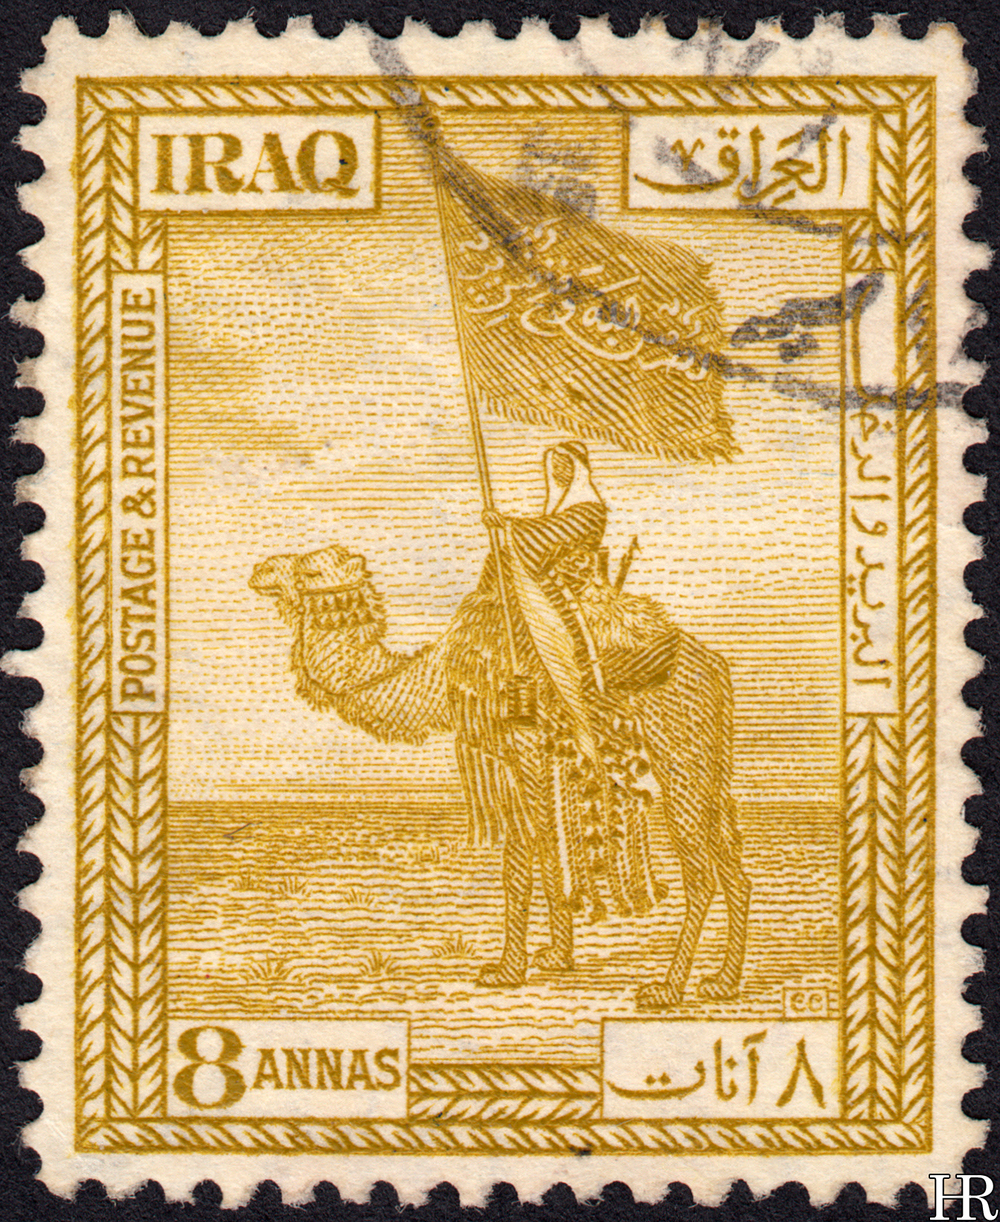 8 annas - Dulaim Camel Corps